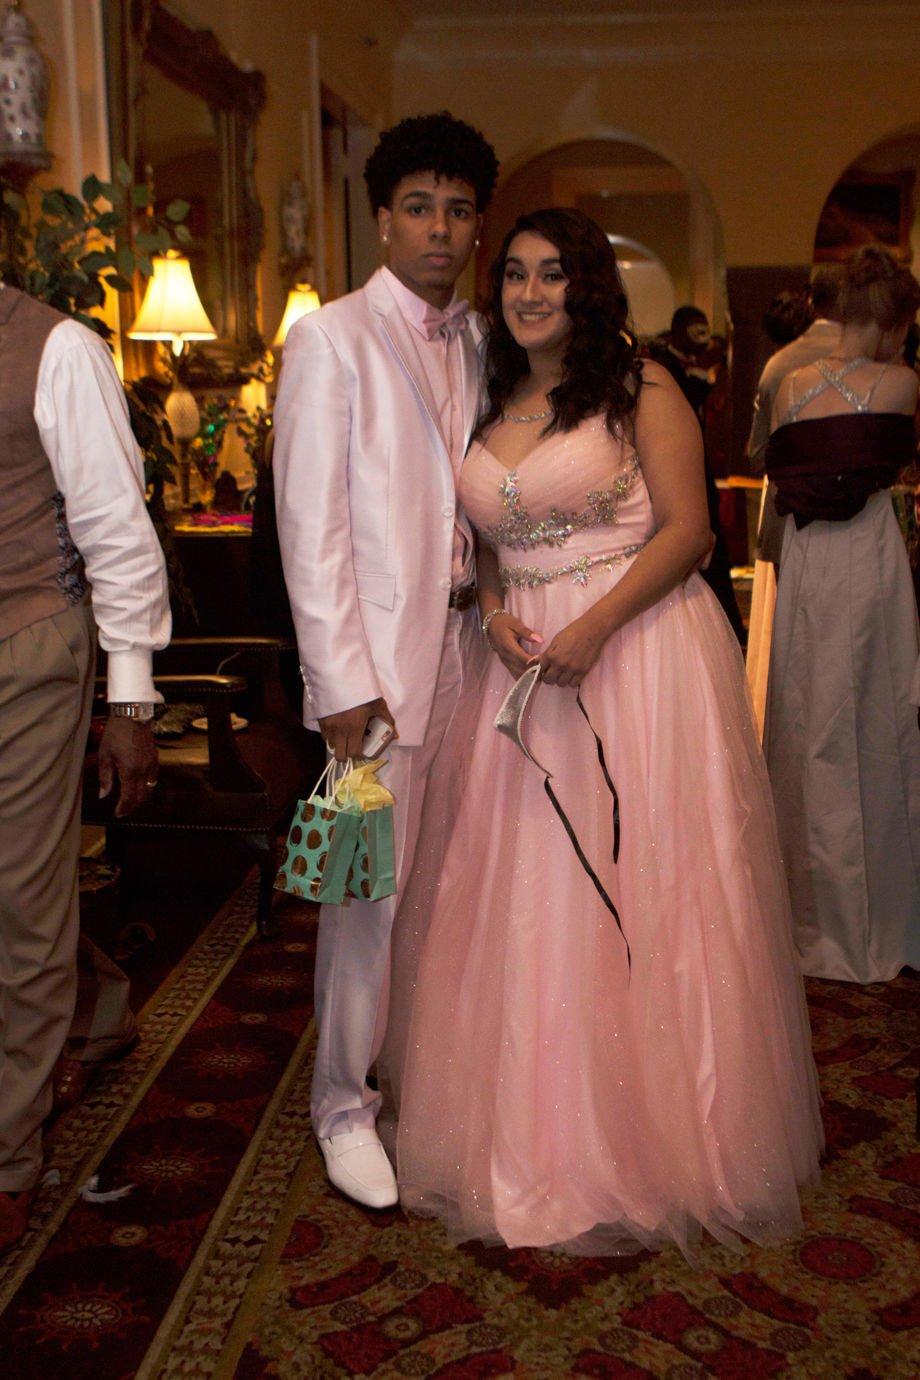 PHOTOS Huguenot High School prom 2017